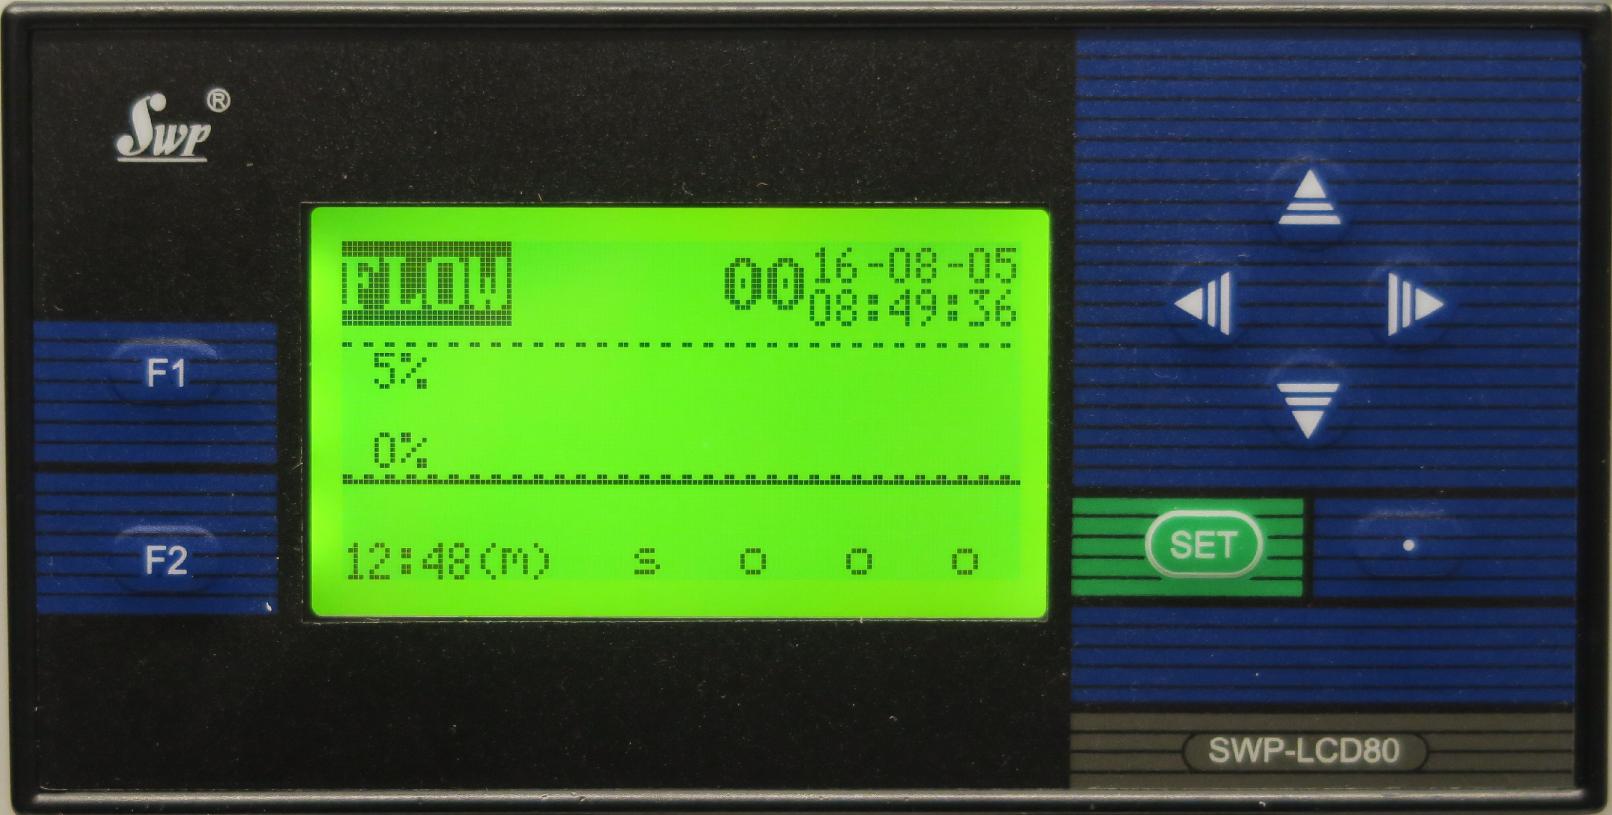 Smart Panelinstrument LCD80